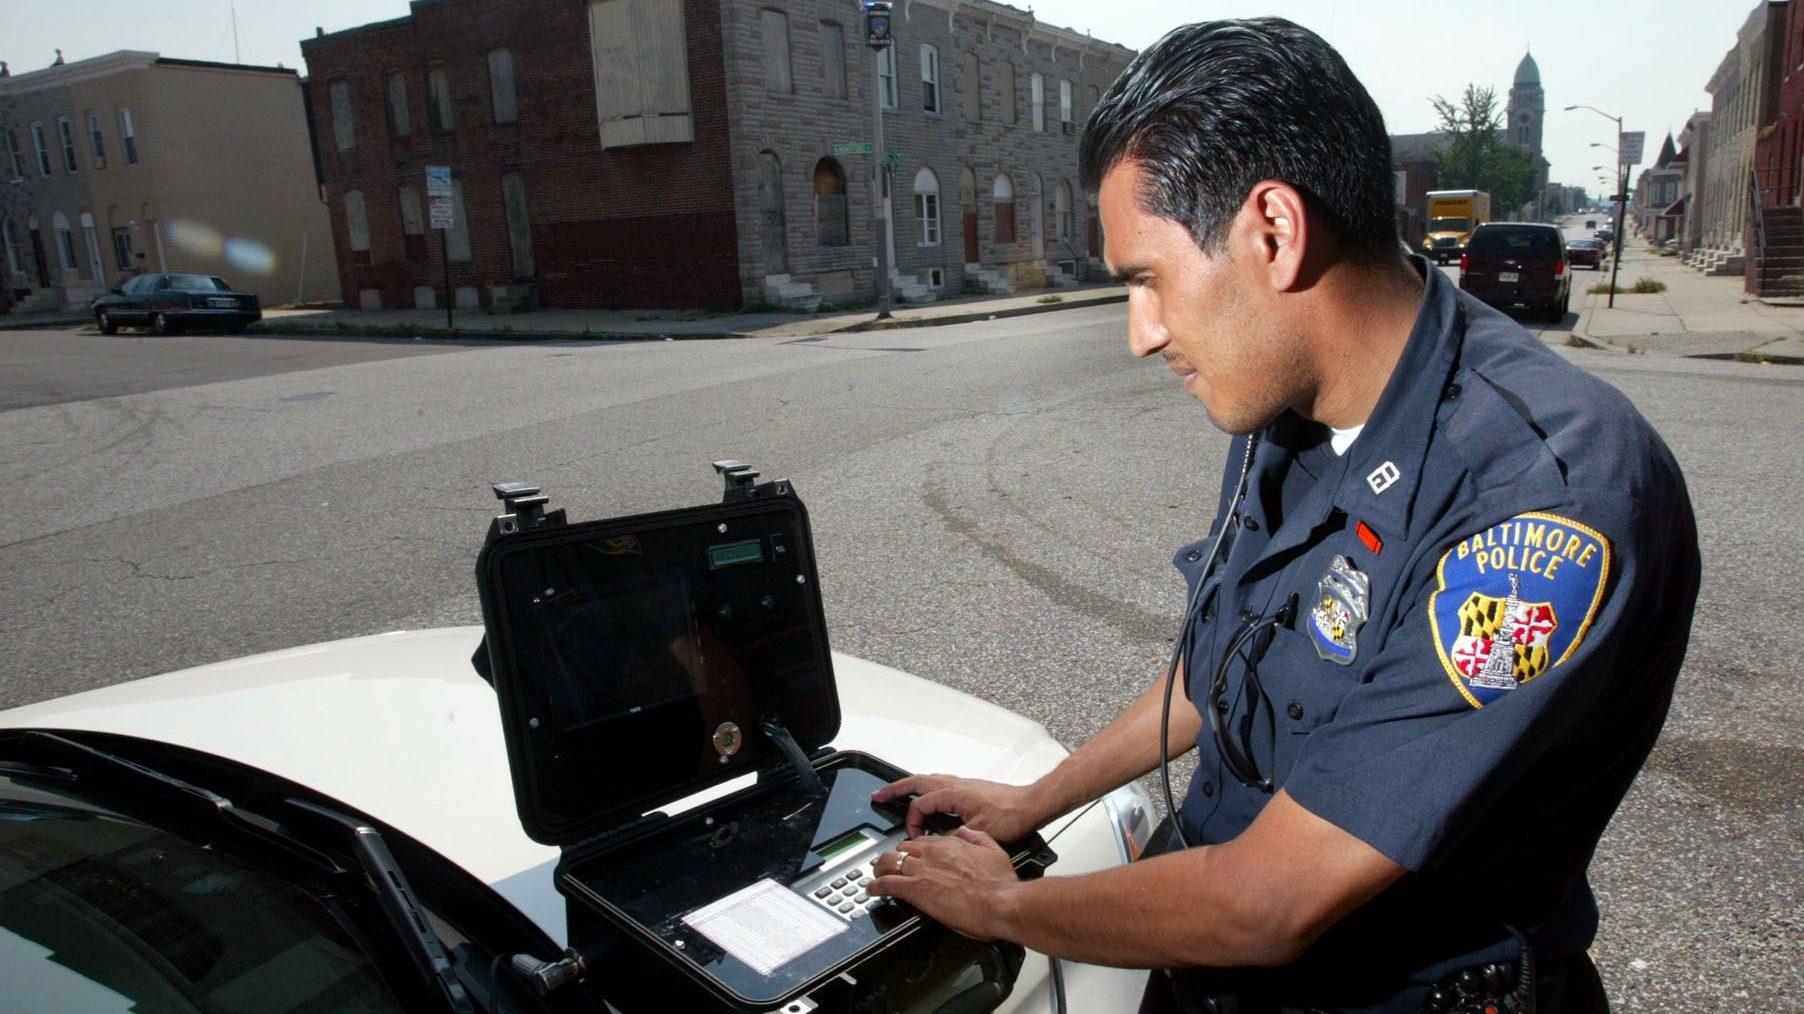 The DEA and ICE are hiding surveillance cameras in